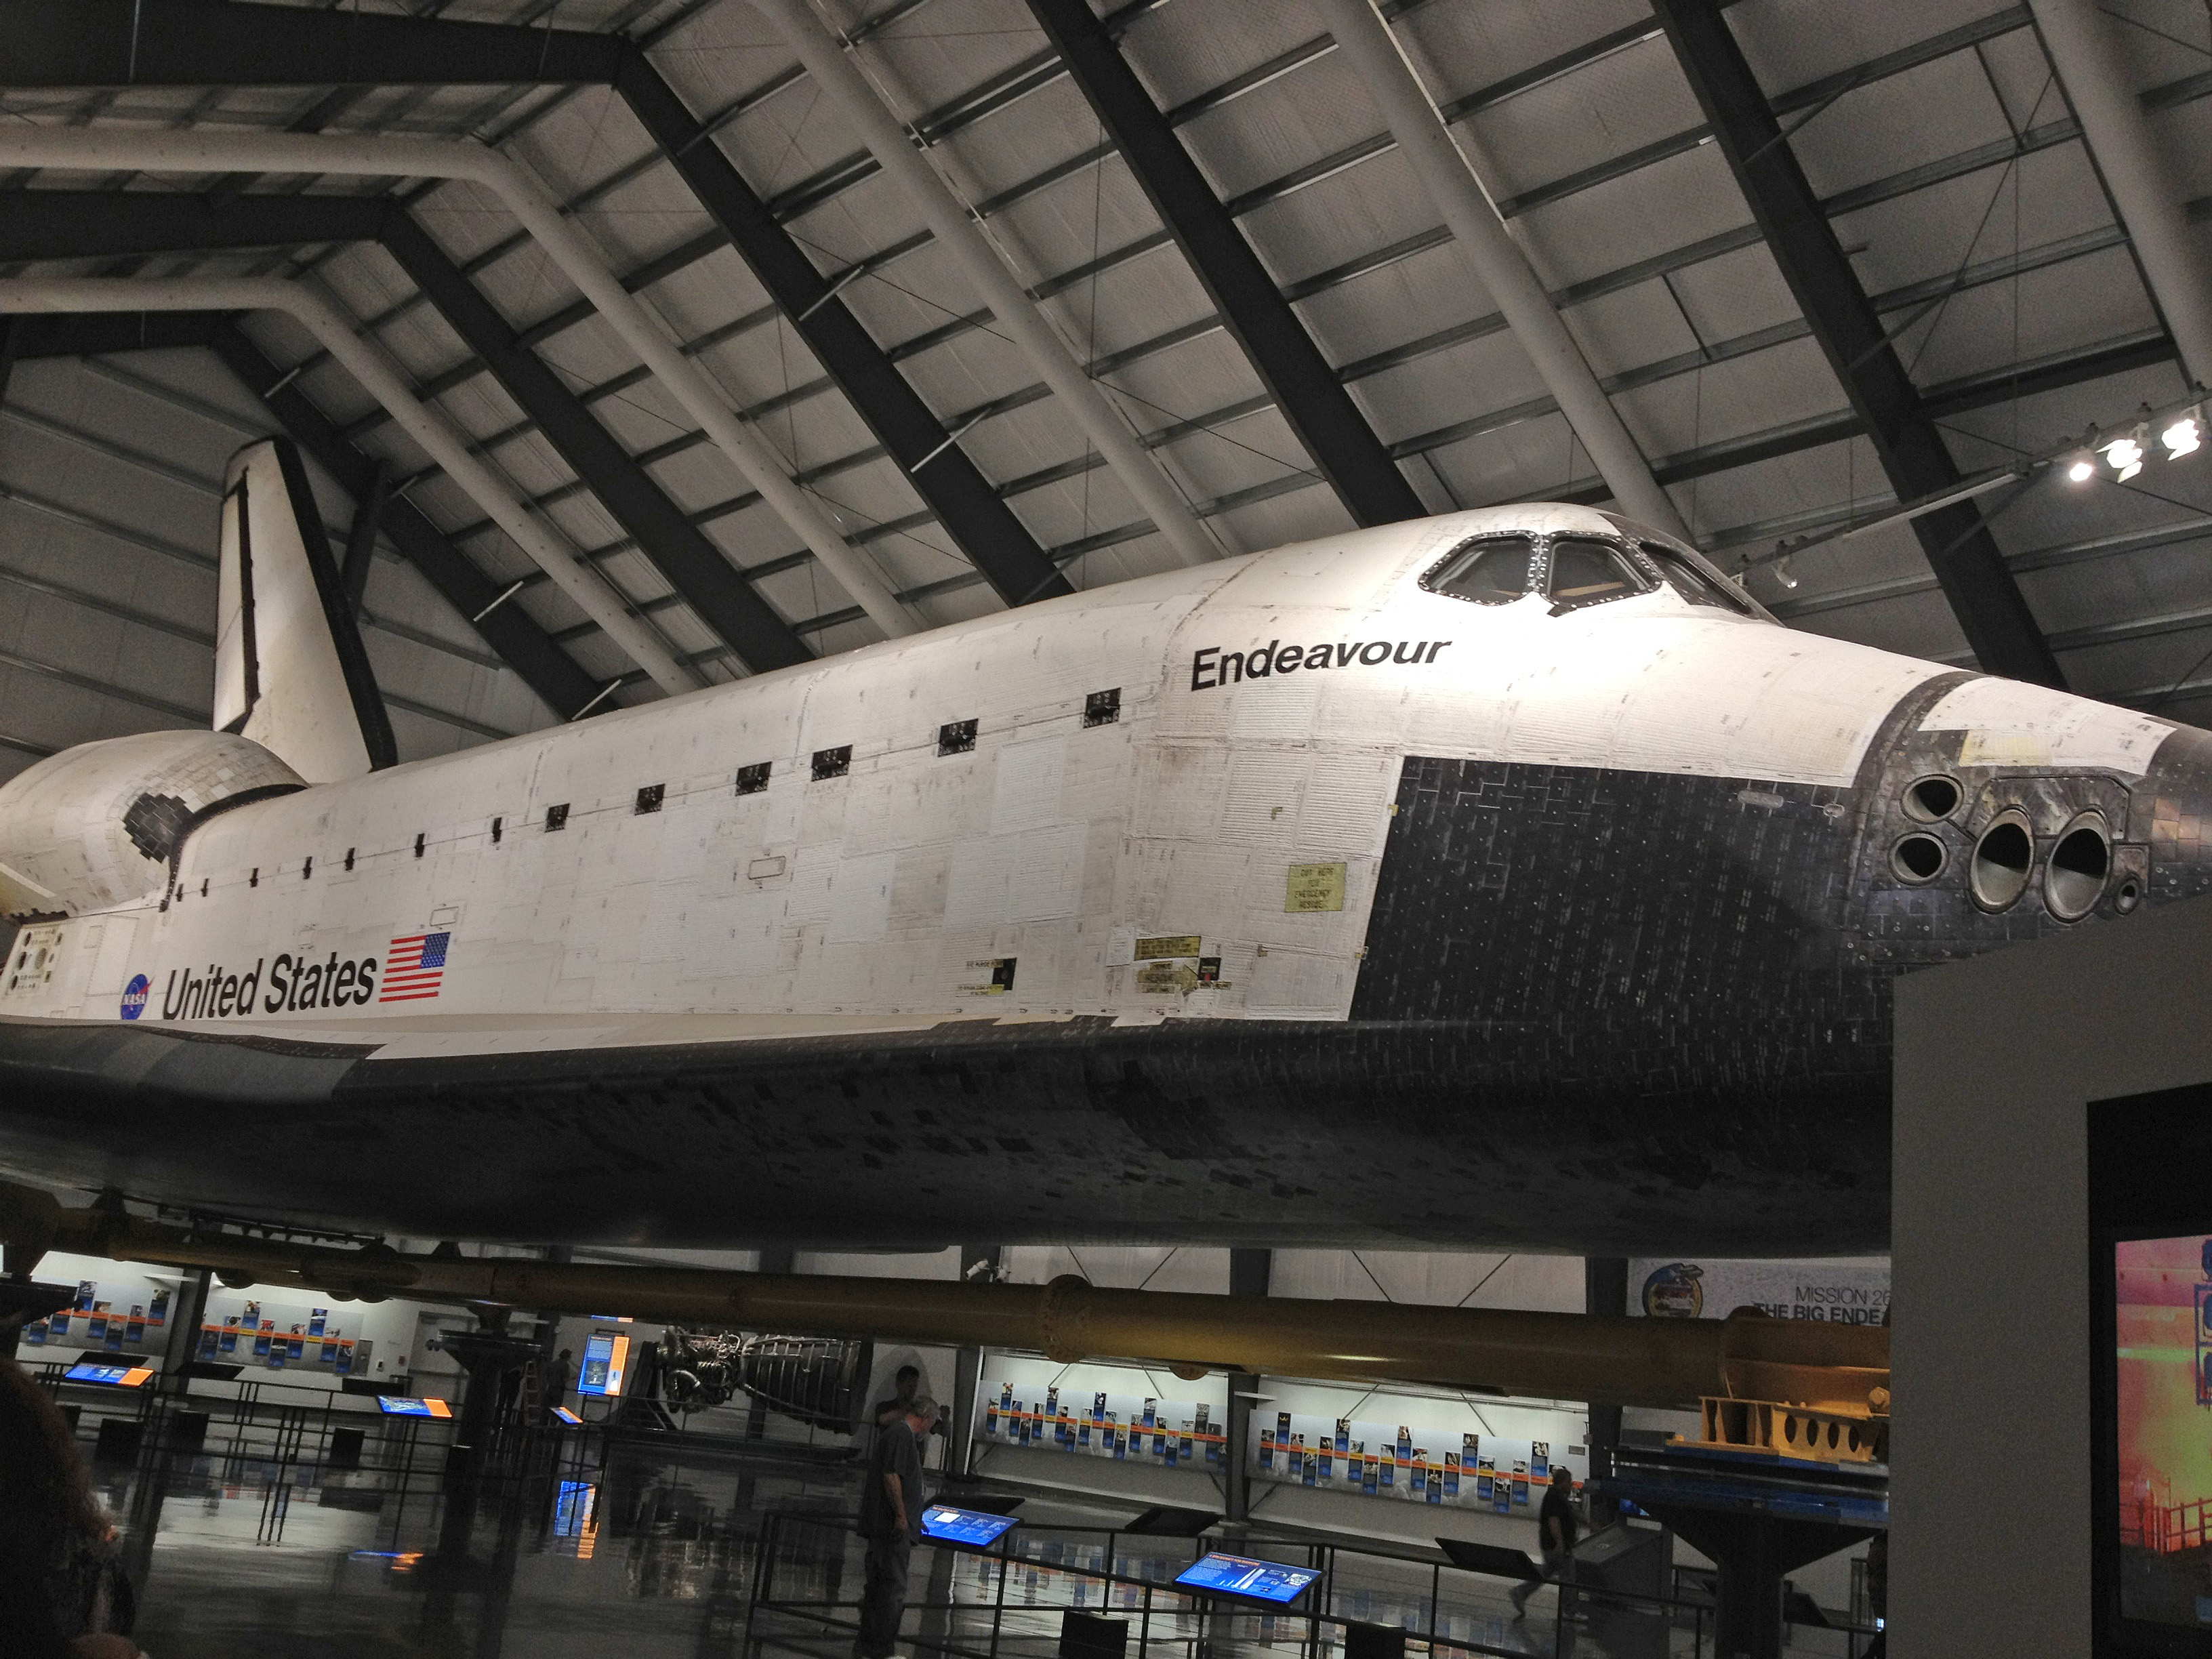 endeavour space shuttle snelheid - photo #40